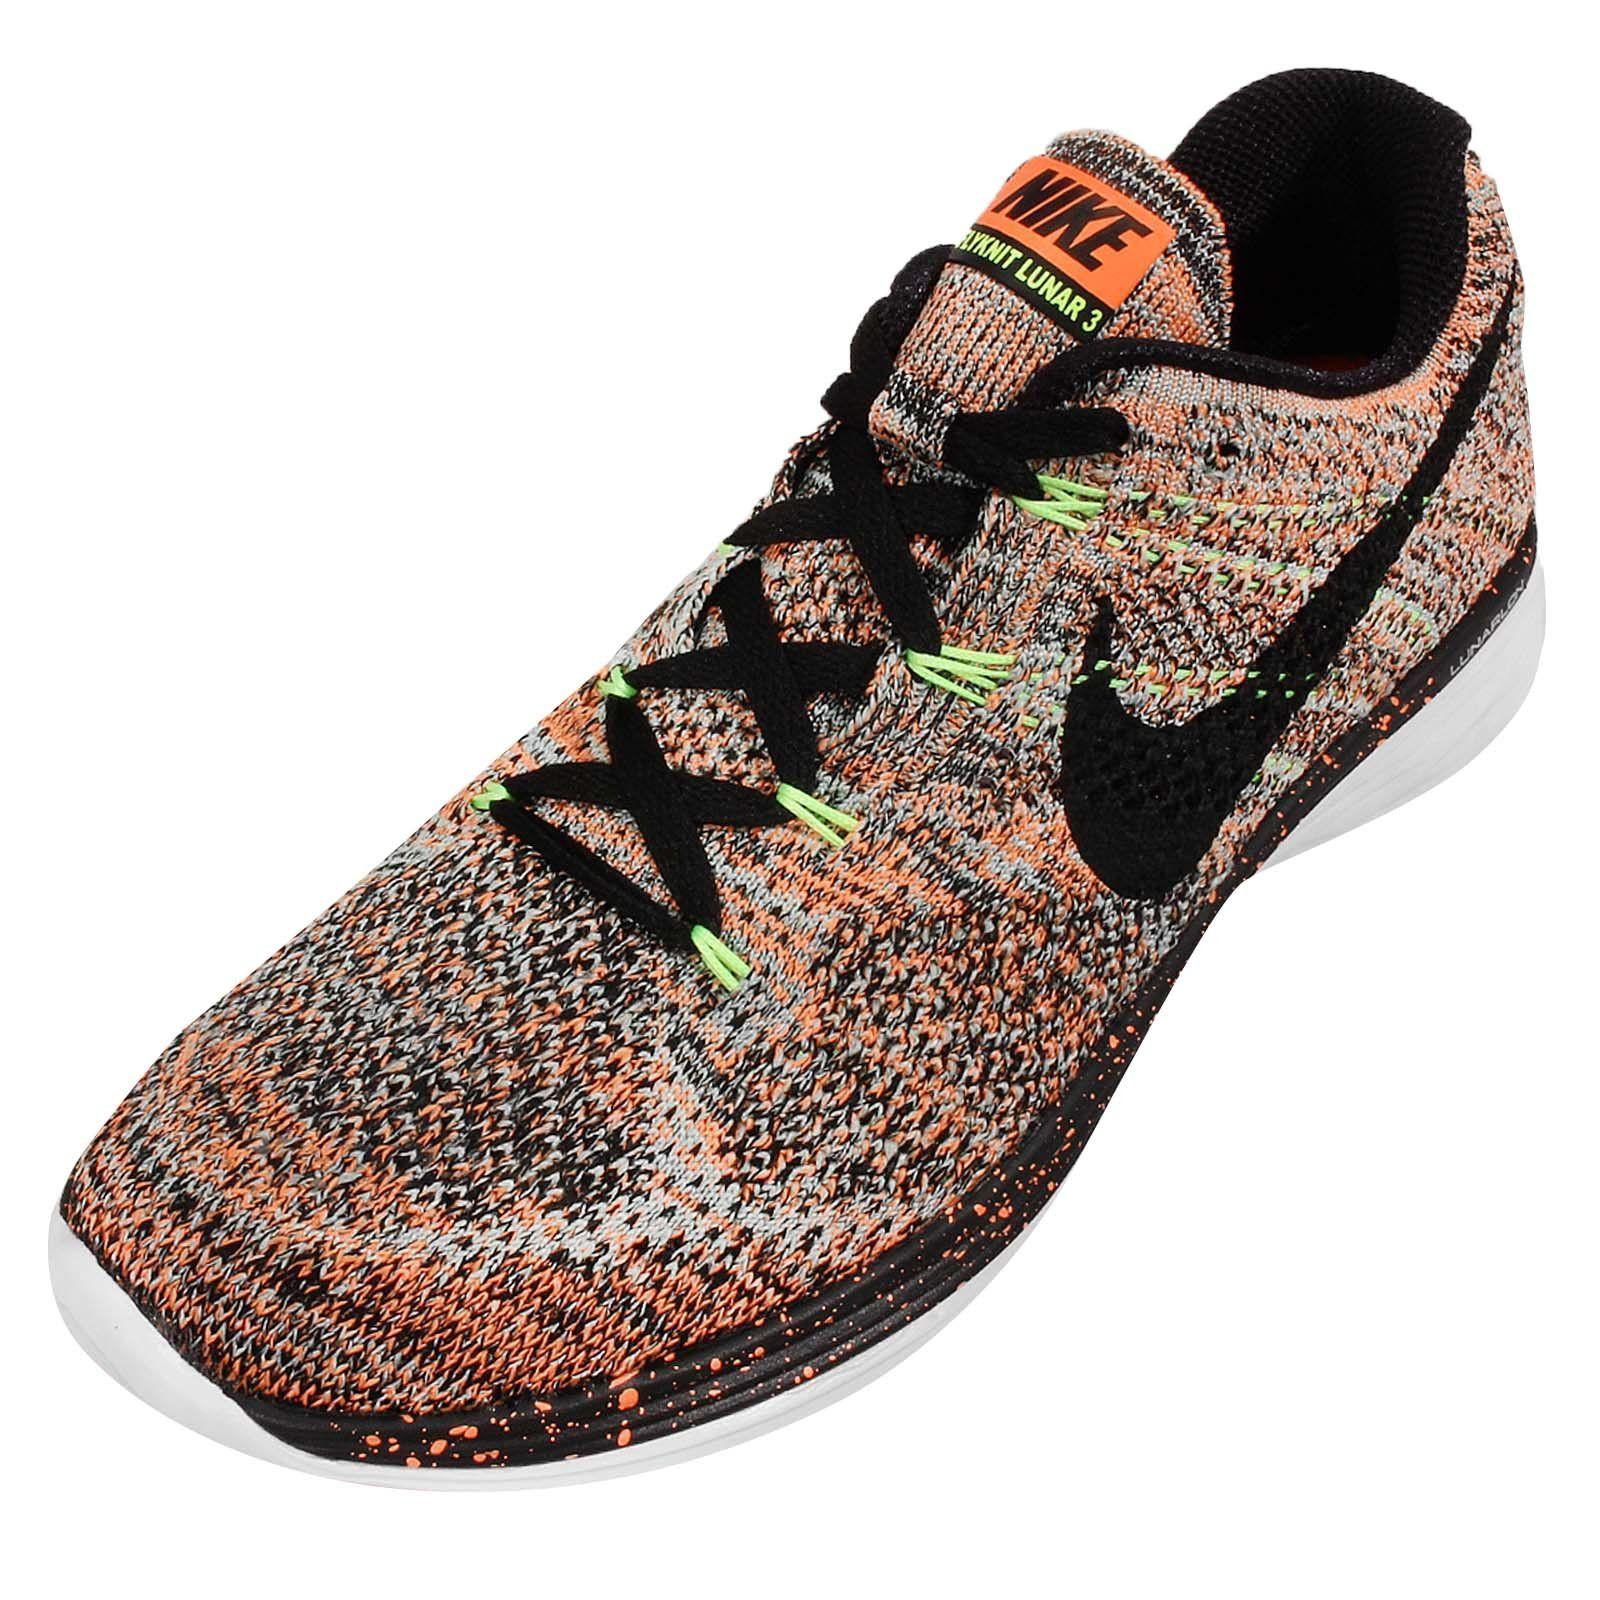 separation shoes da116 fbc40 Nike WMNS FLYKNIT LUNAR3 womens running-shoes 698182 ...